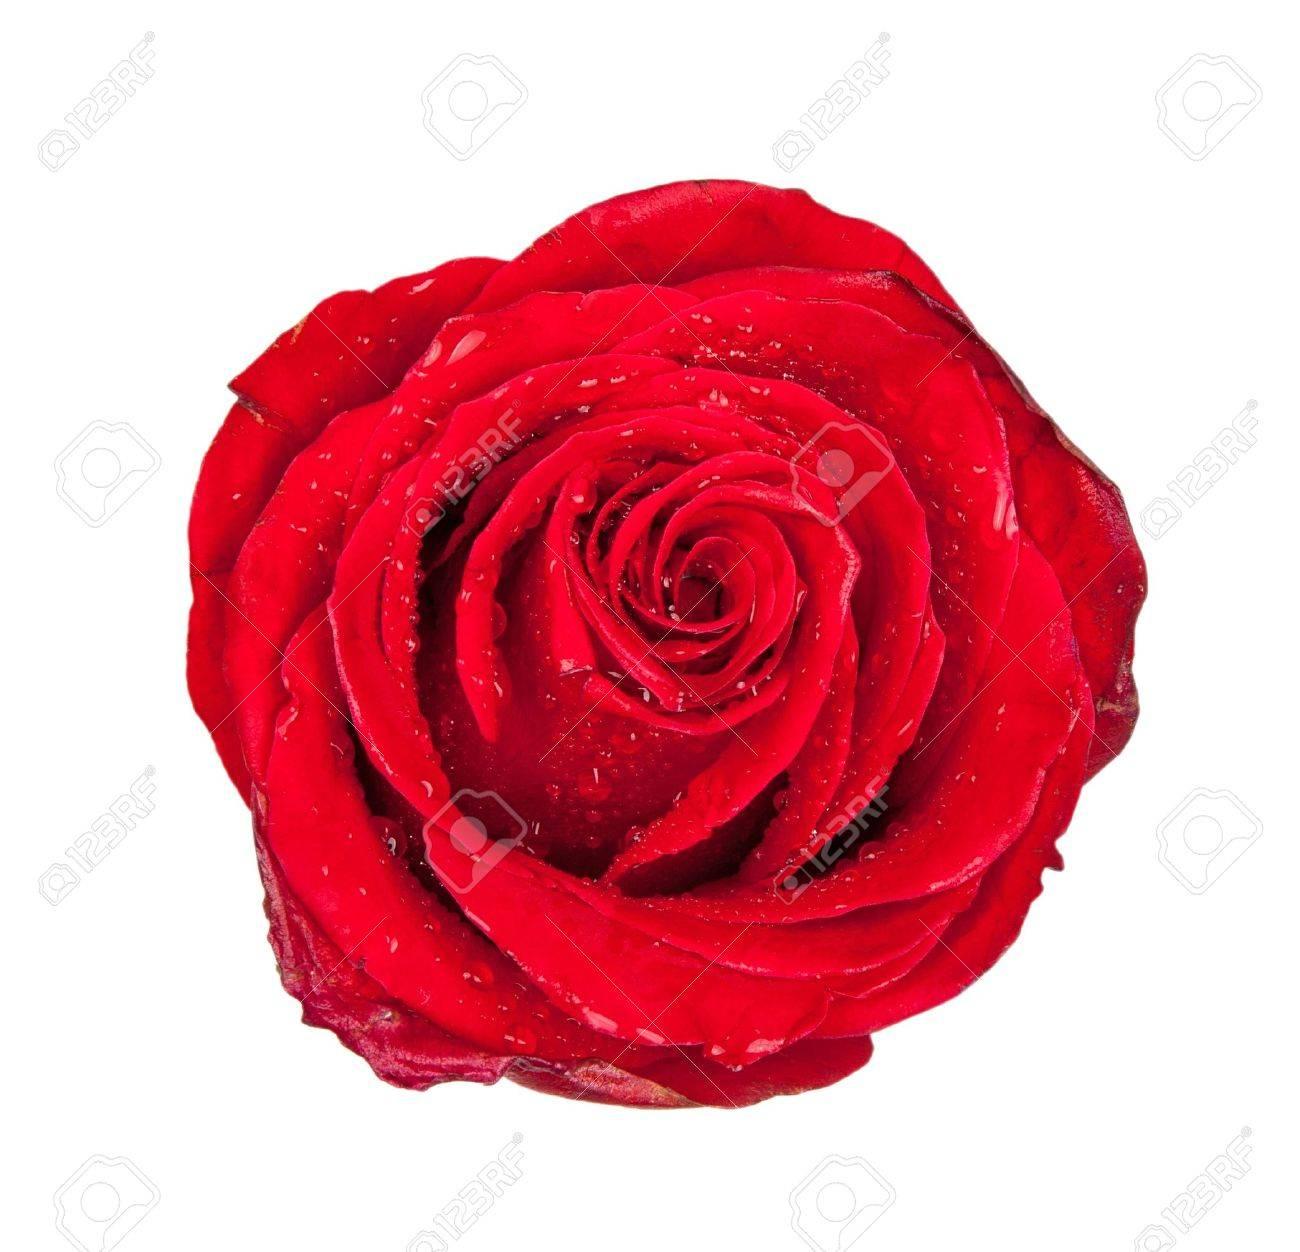 Red rose bud isolated on white background Stock Photo - 8504459